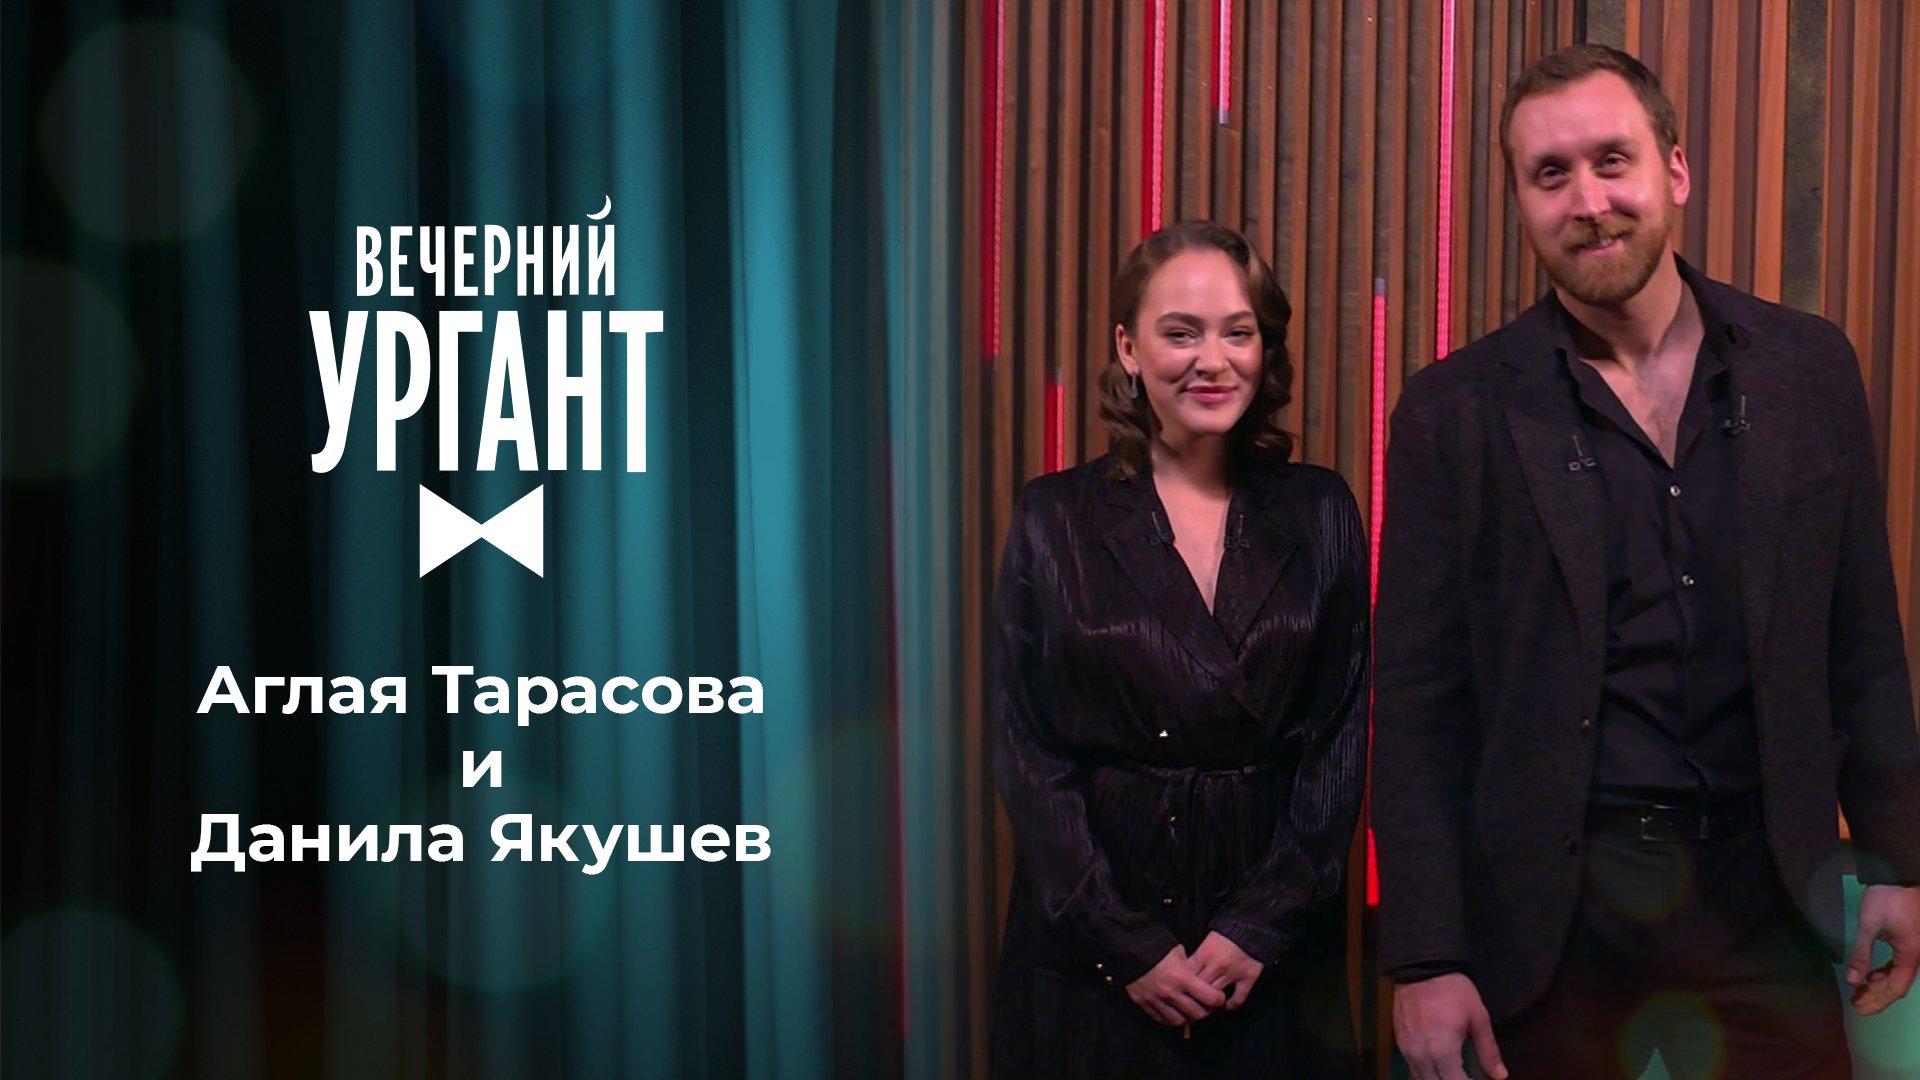 «Вечерний Ургант». Аглая Тарасова иДанила Якушев